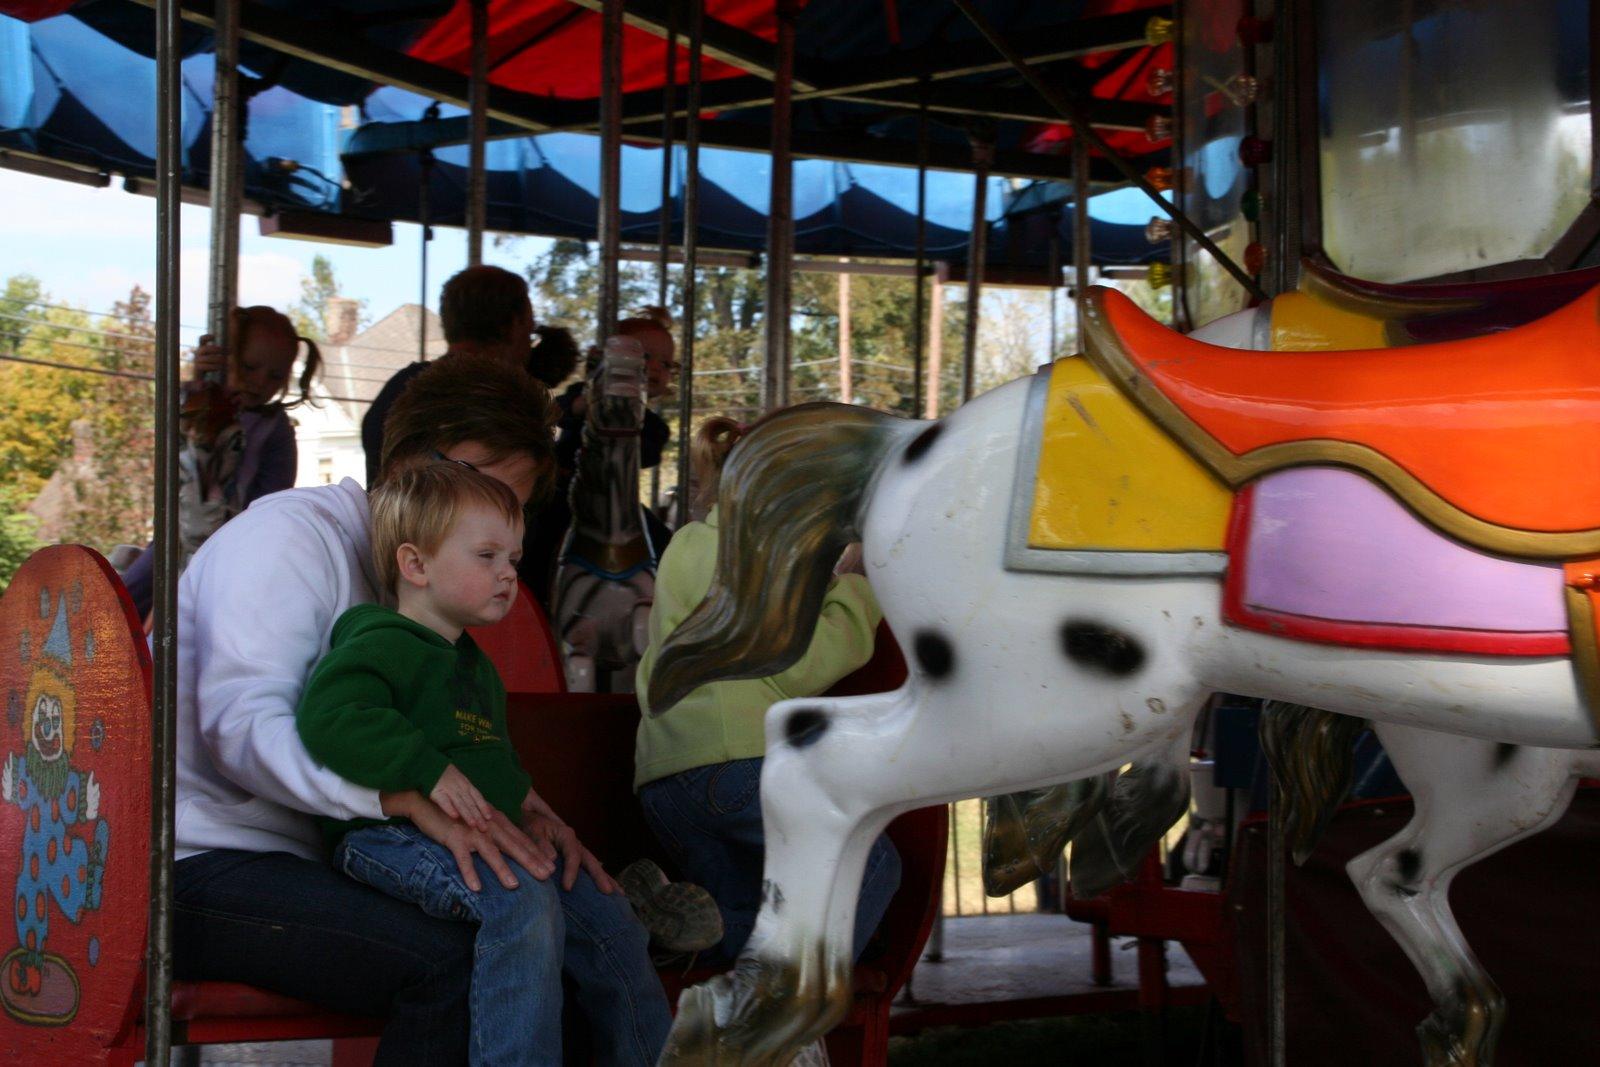 carnival-rides-50